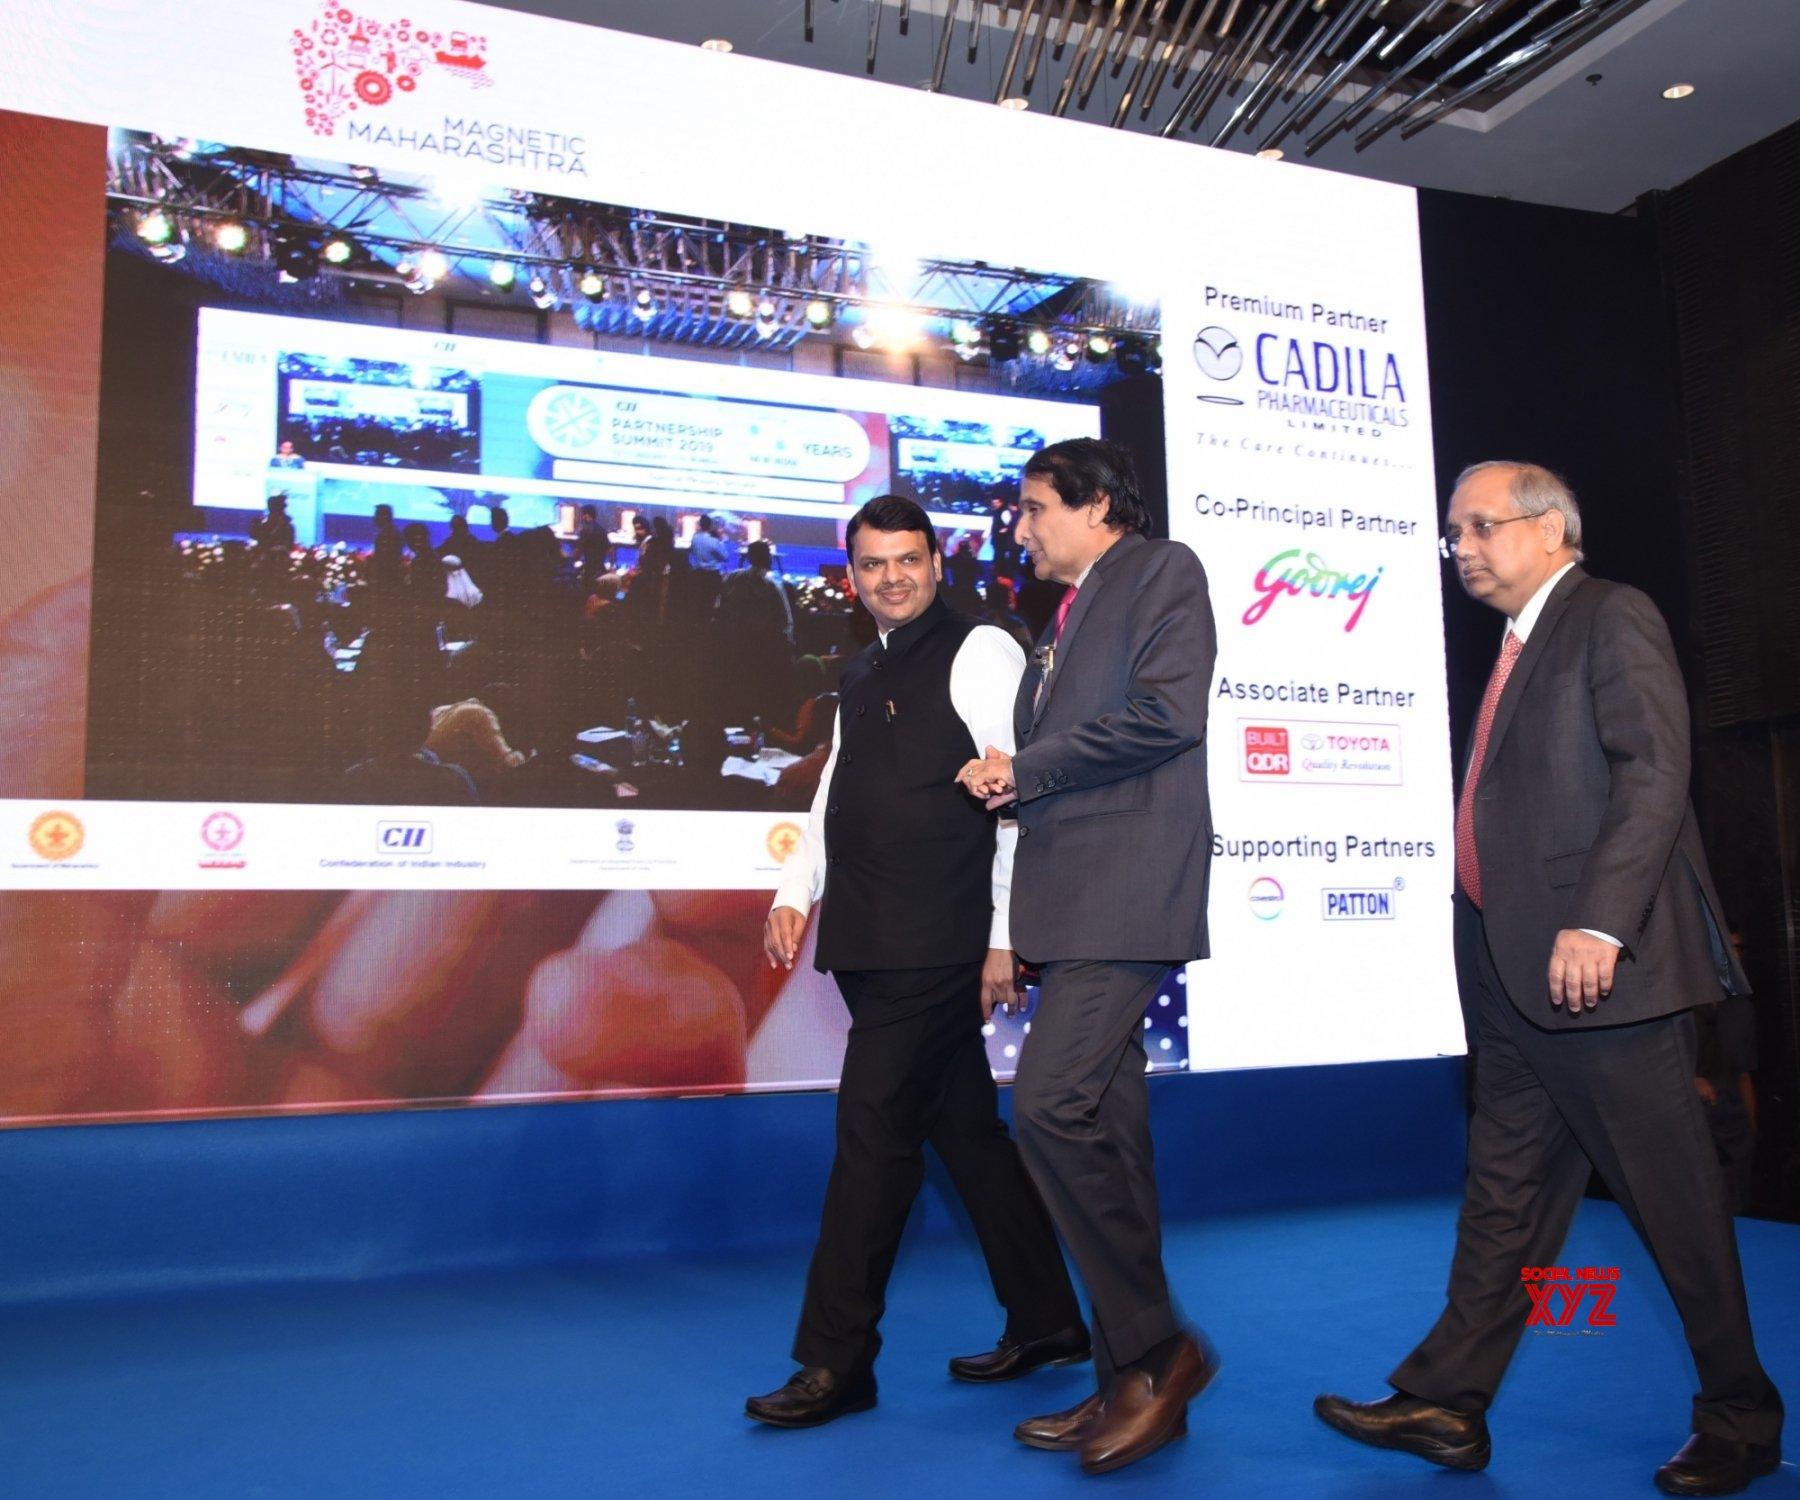 Mumbai: CII Partnership Summit 2019 - Devendra Fadnavis, Suresh Prabhakar #Gallery